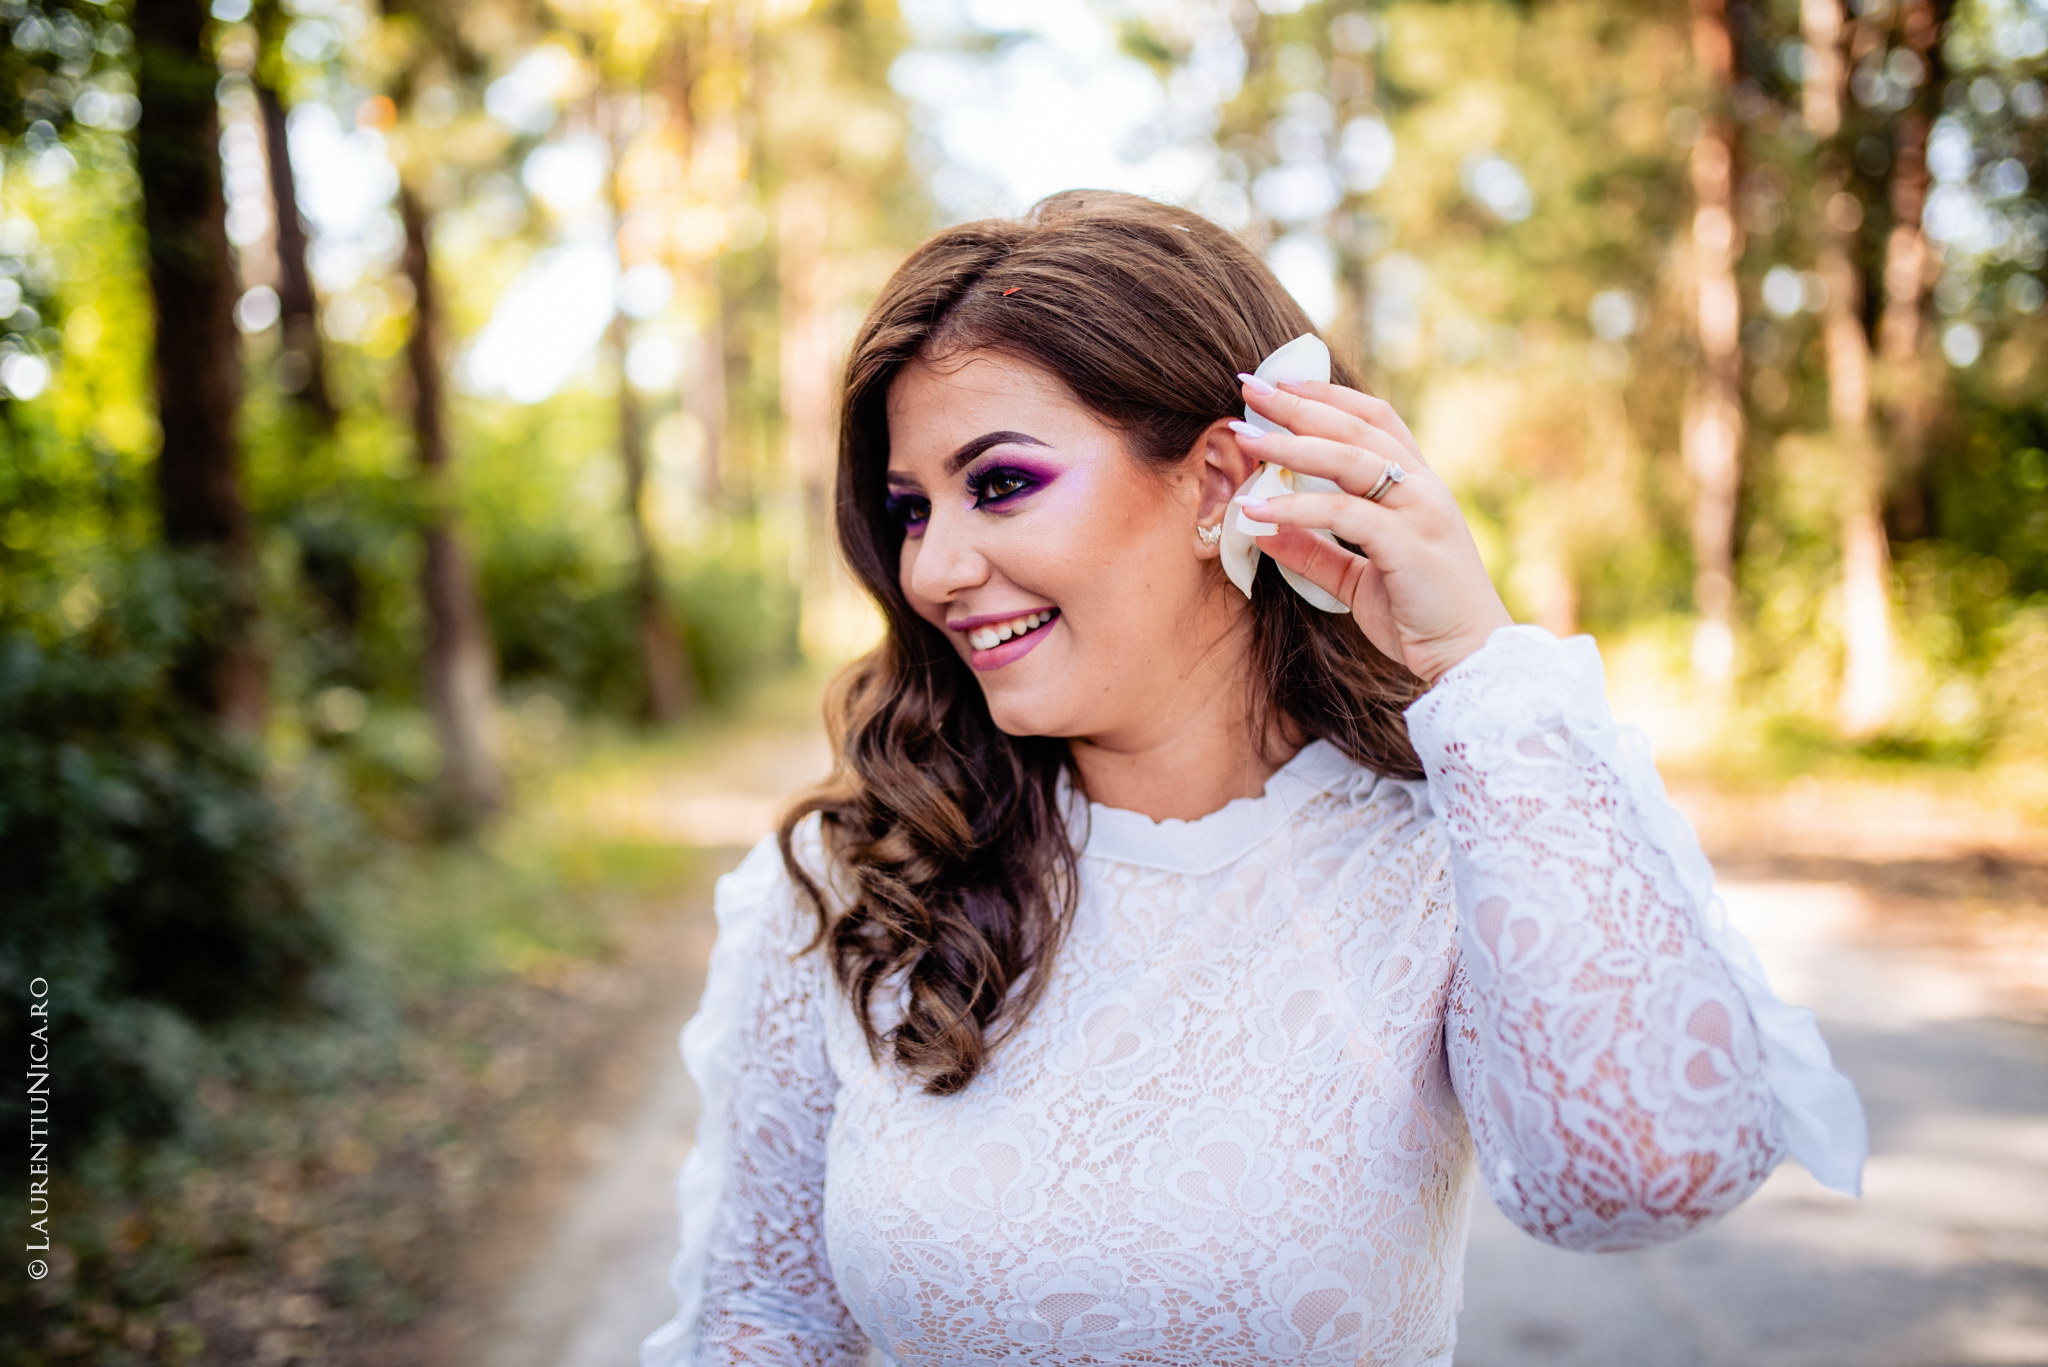 fotografii nunta Roxana si Cosmin fotograf nunta laurentiu nica 08 - Roxana & Cosmin | Fotografii nunta | Ticleni, judetul Gorj